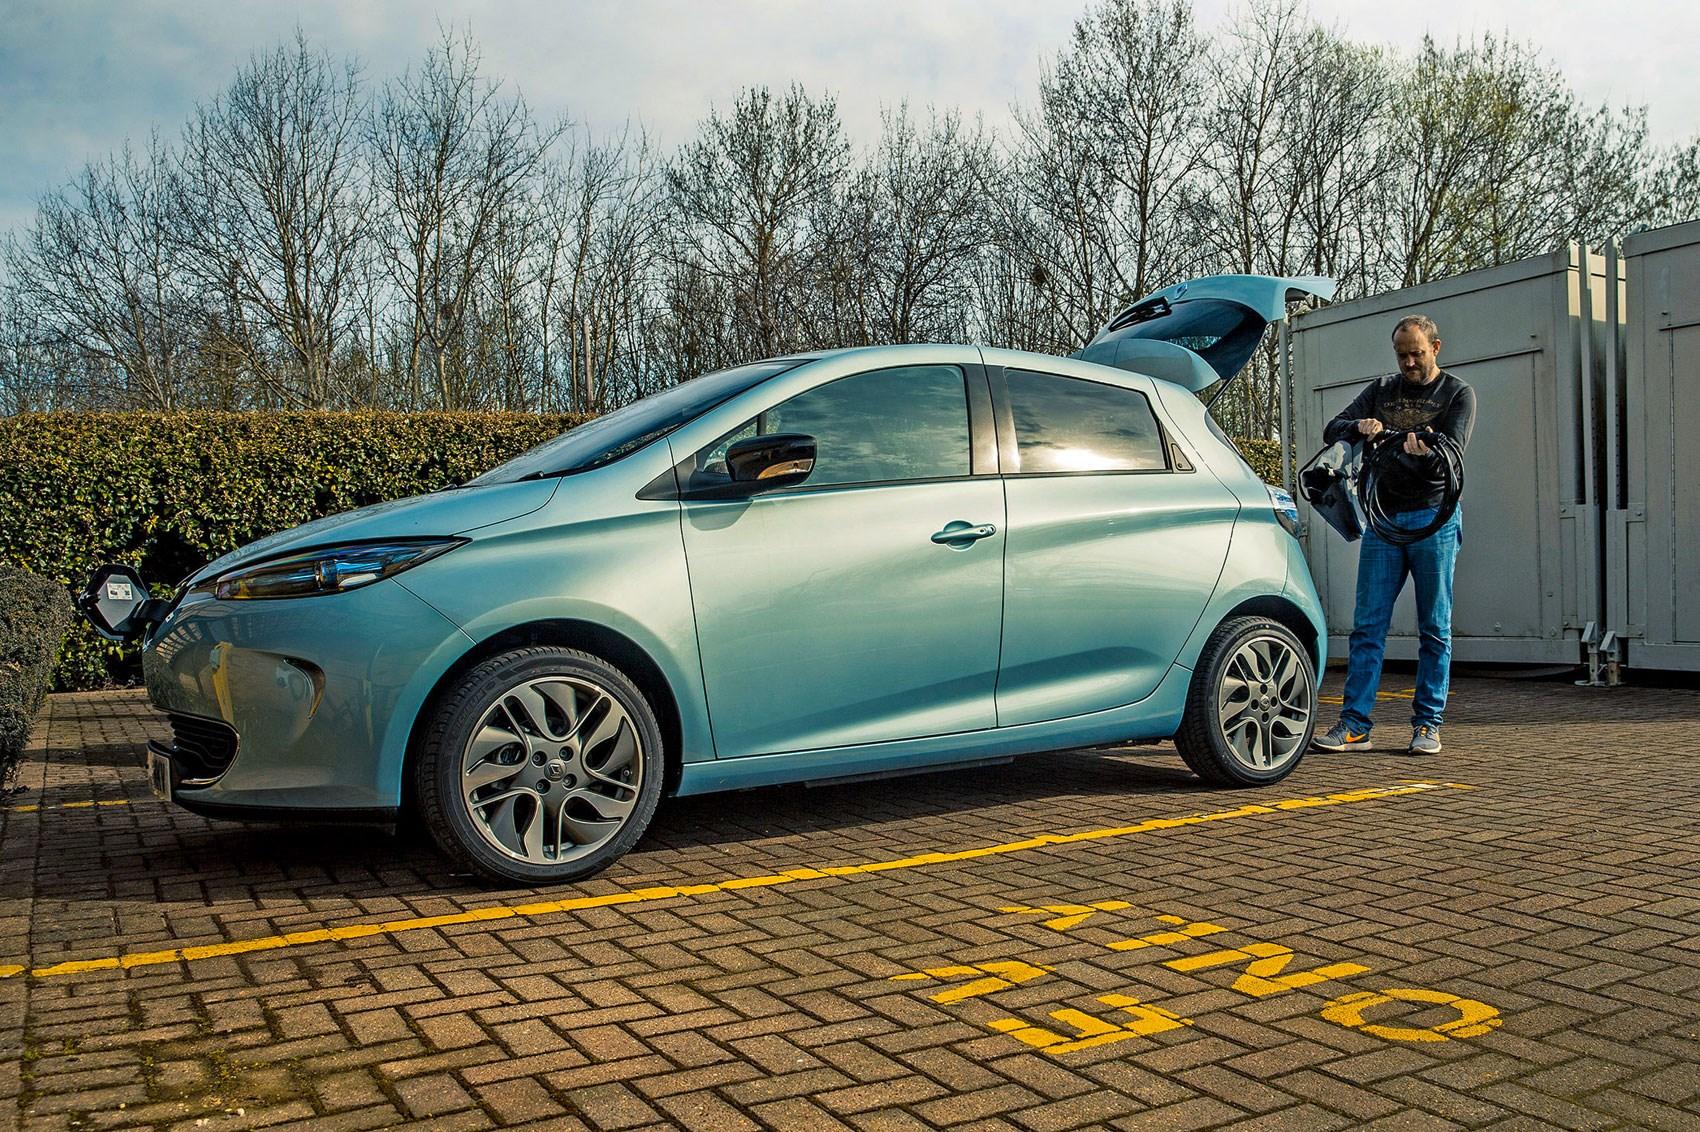 Renault Zoe (2017) long-term test: the final report | CAR